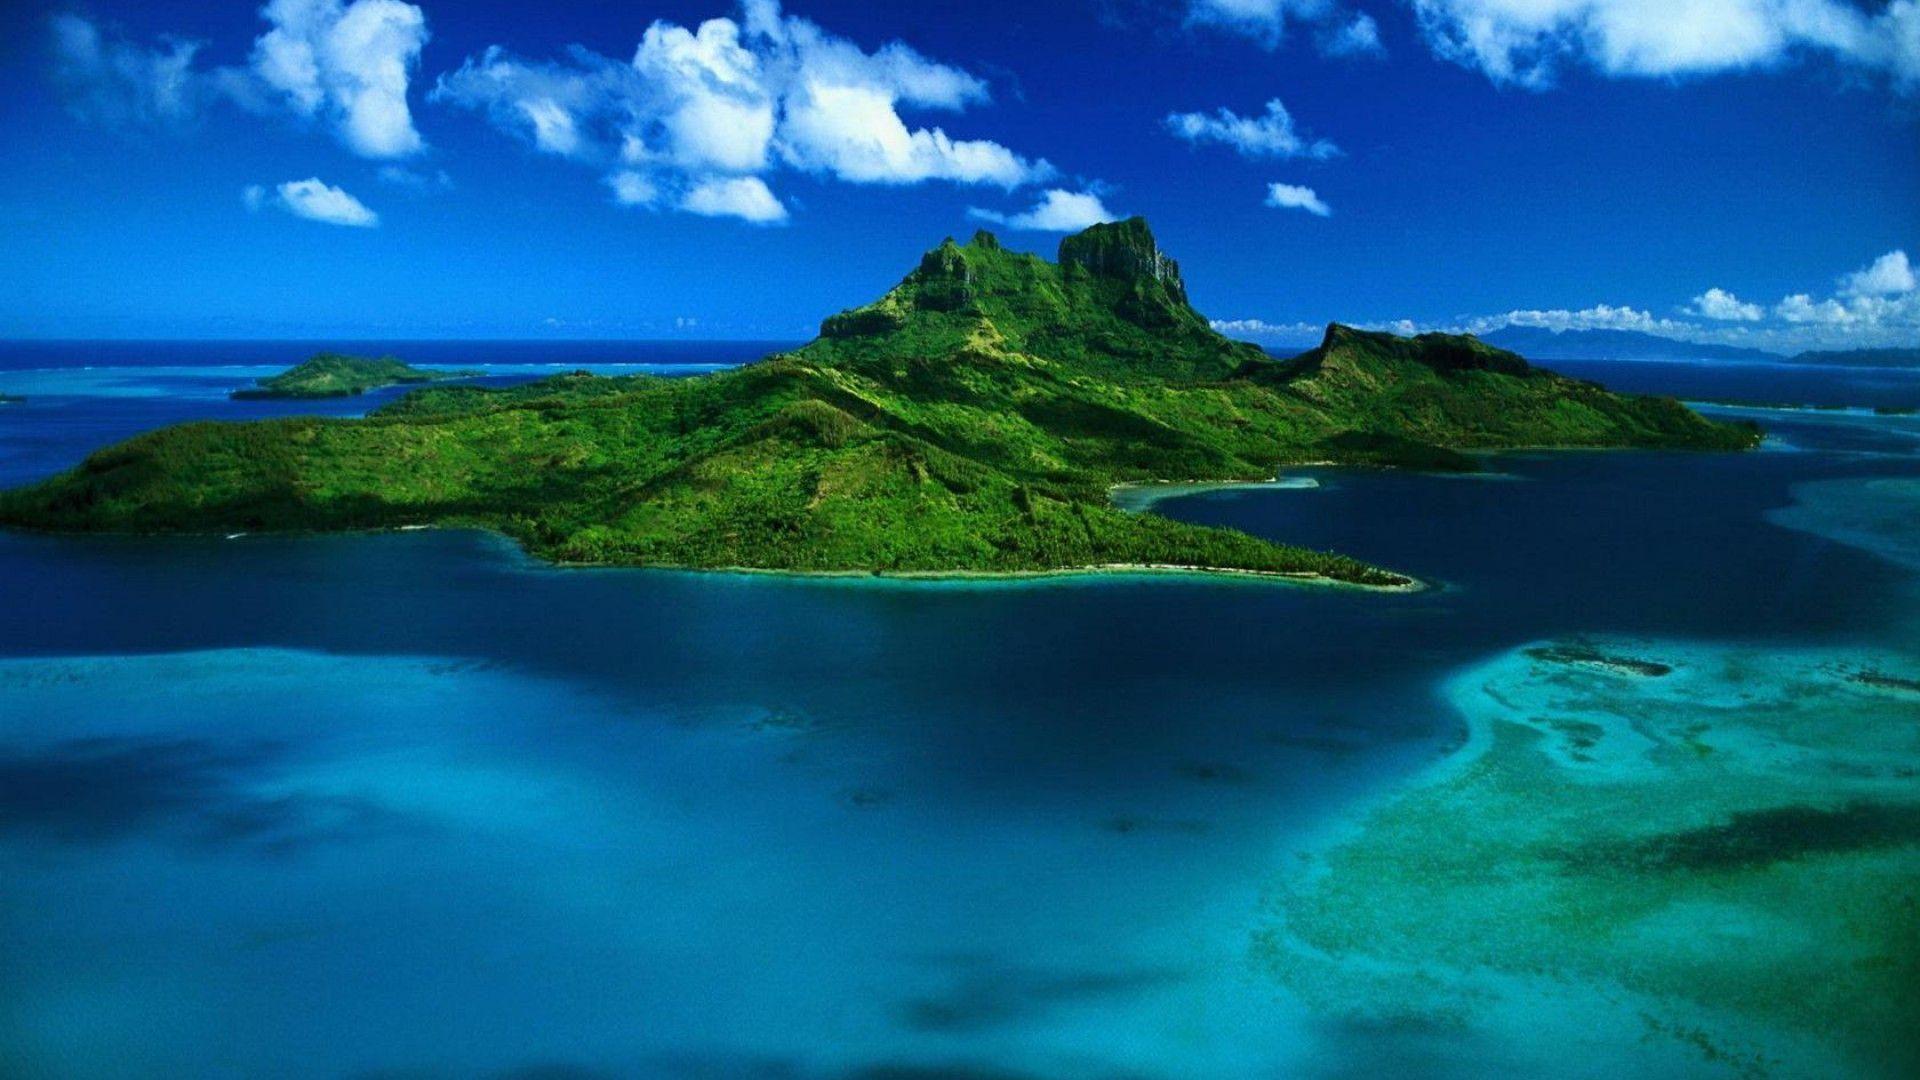 Bora Bora hd image